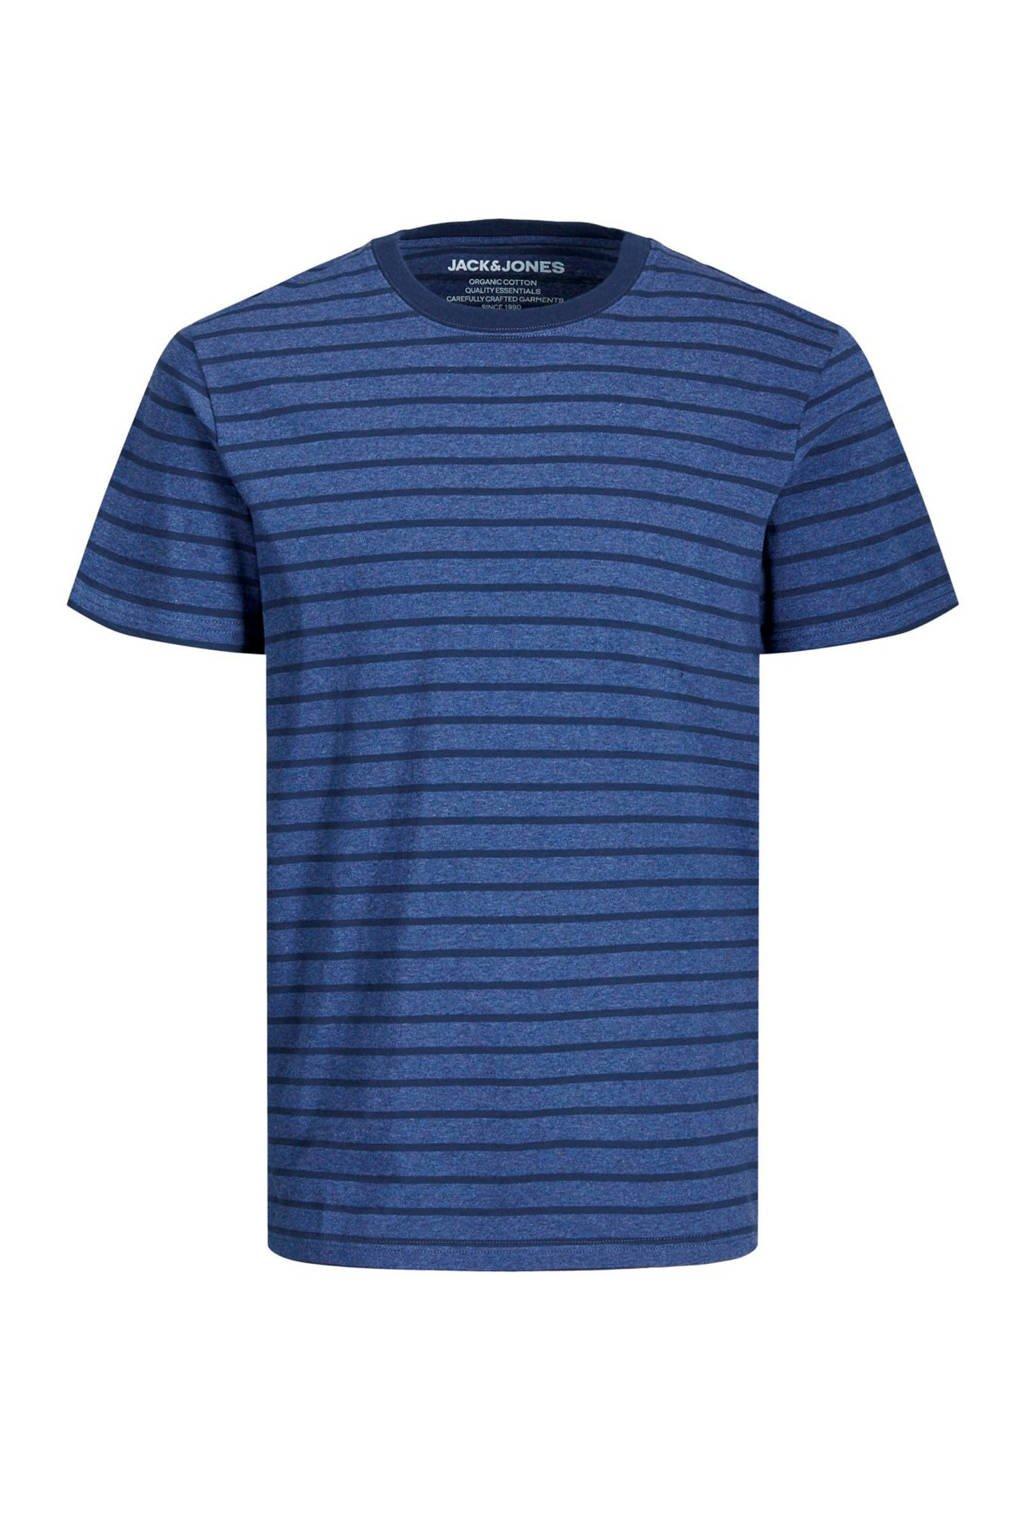 JACK & JONES JUNIOR gestreept T-shirt Striped blauw/donkerblauw, Blauw/donkerblauw